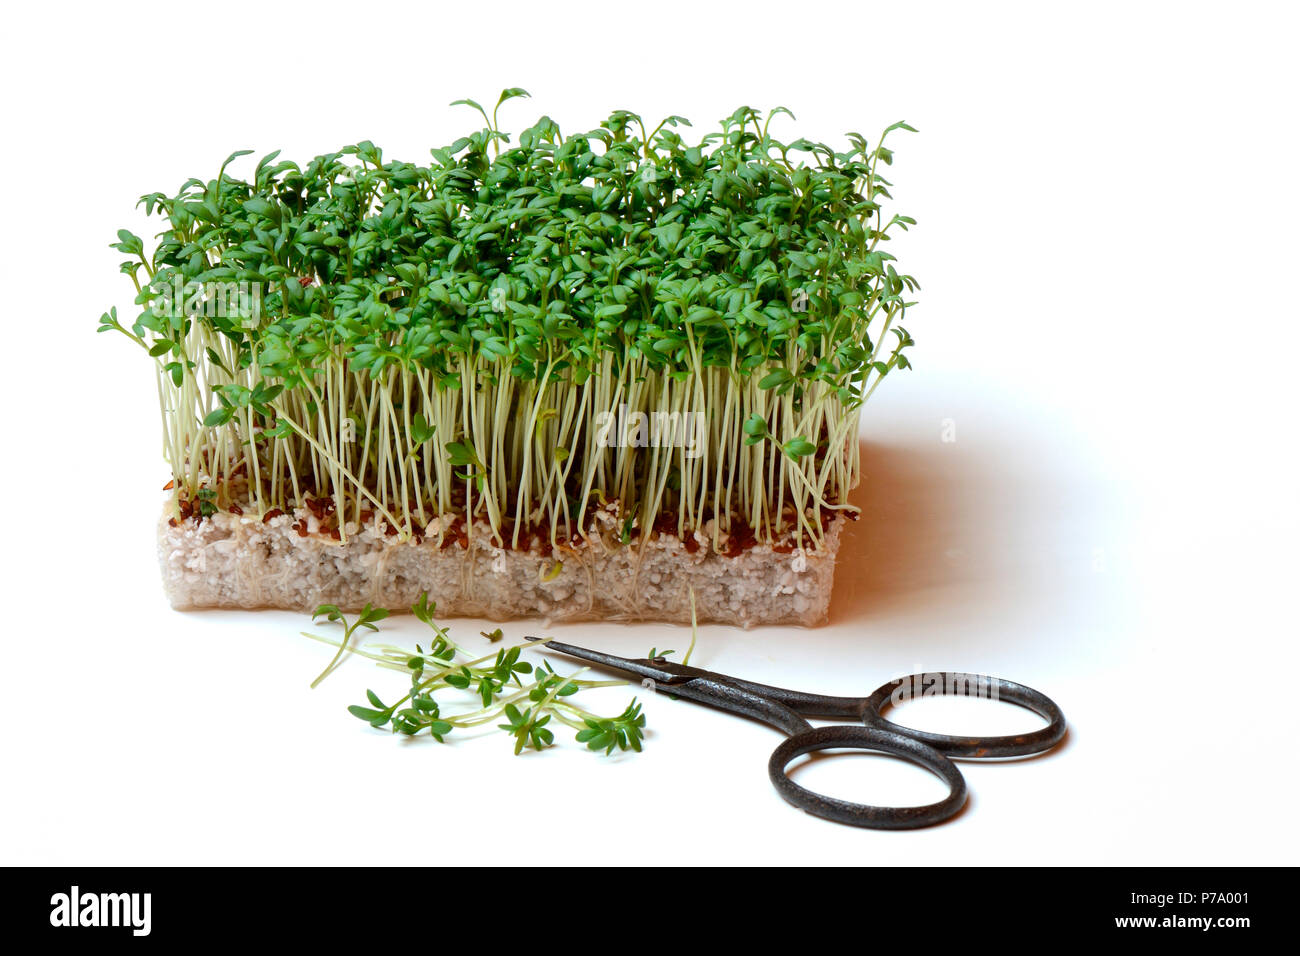 Berühmt Gartenkresse, Lepidium sativum, Kresse-Sprossen, Kressesprossen @MI_65